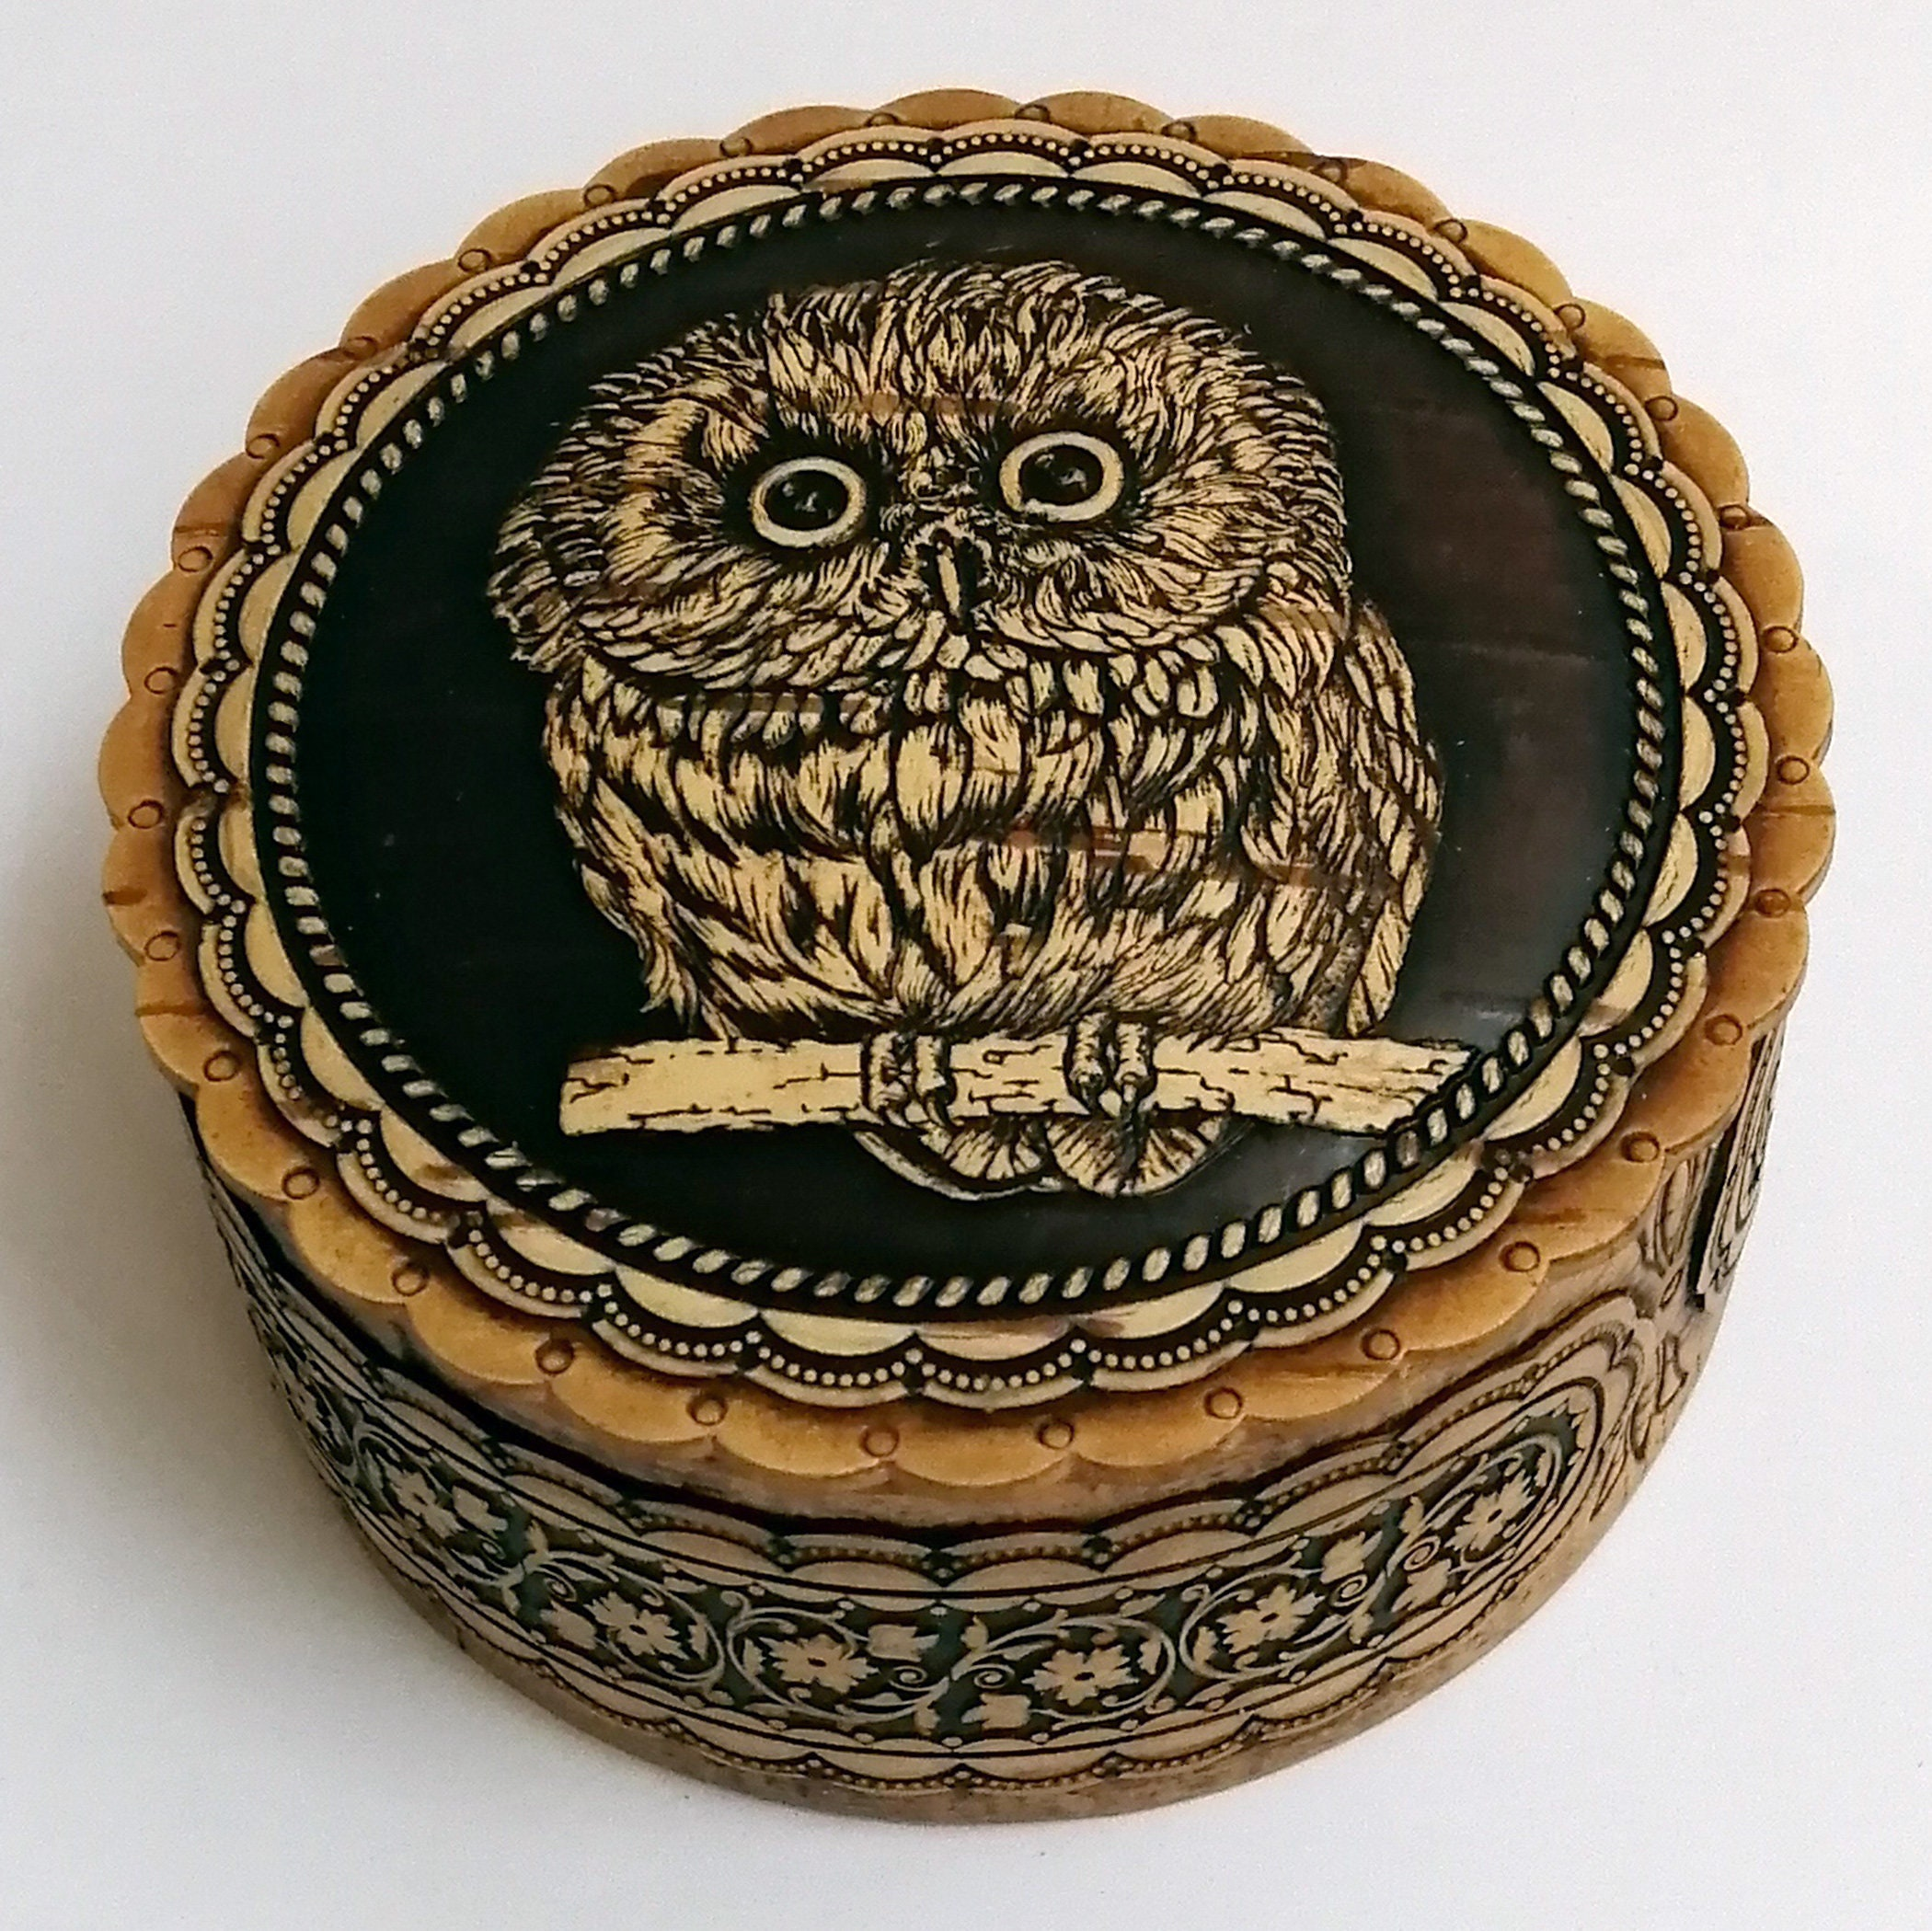 Birch Bark Box - Wood Trinket Box, Owl Gift, Jewelry Box, Wedding Gift, Owl Lovers, Bird Lover Gift, Ring Box, Eco Friendly Gifts